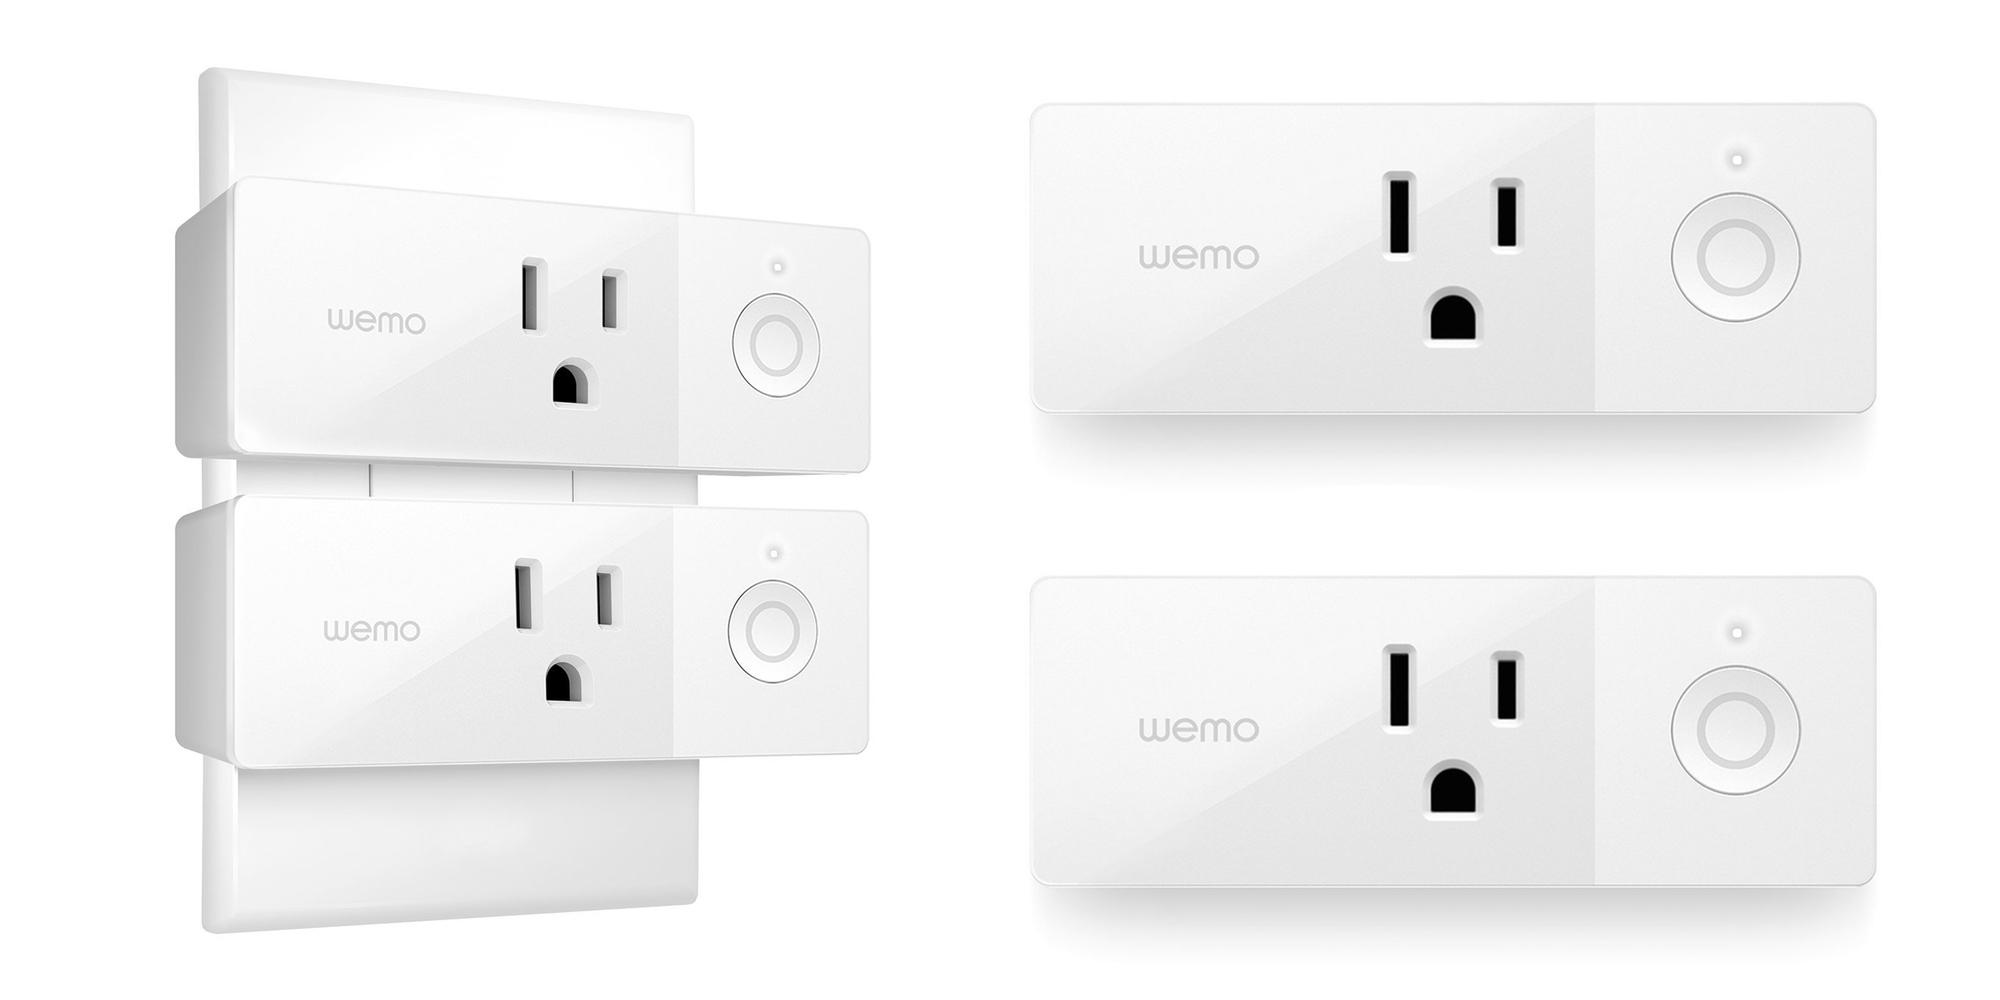 Belkin's Wemo Mini Smart Plugs work w/ Apple HomeKit: 2-pack for $37 (Refurb, Orig. $70)